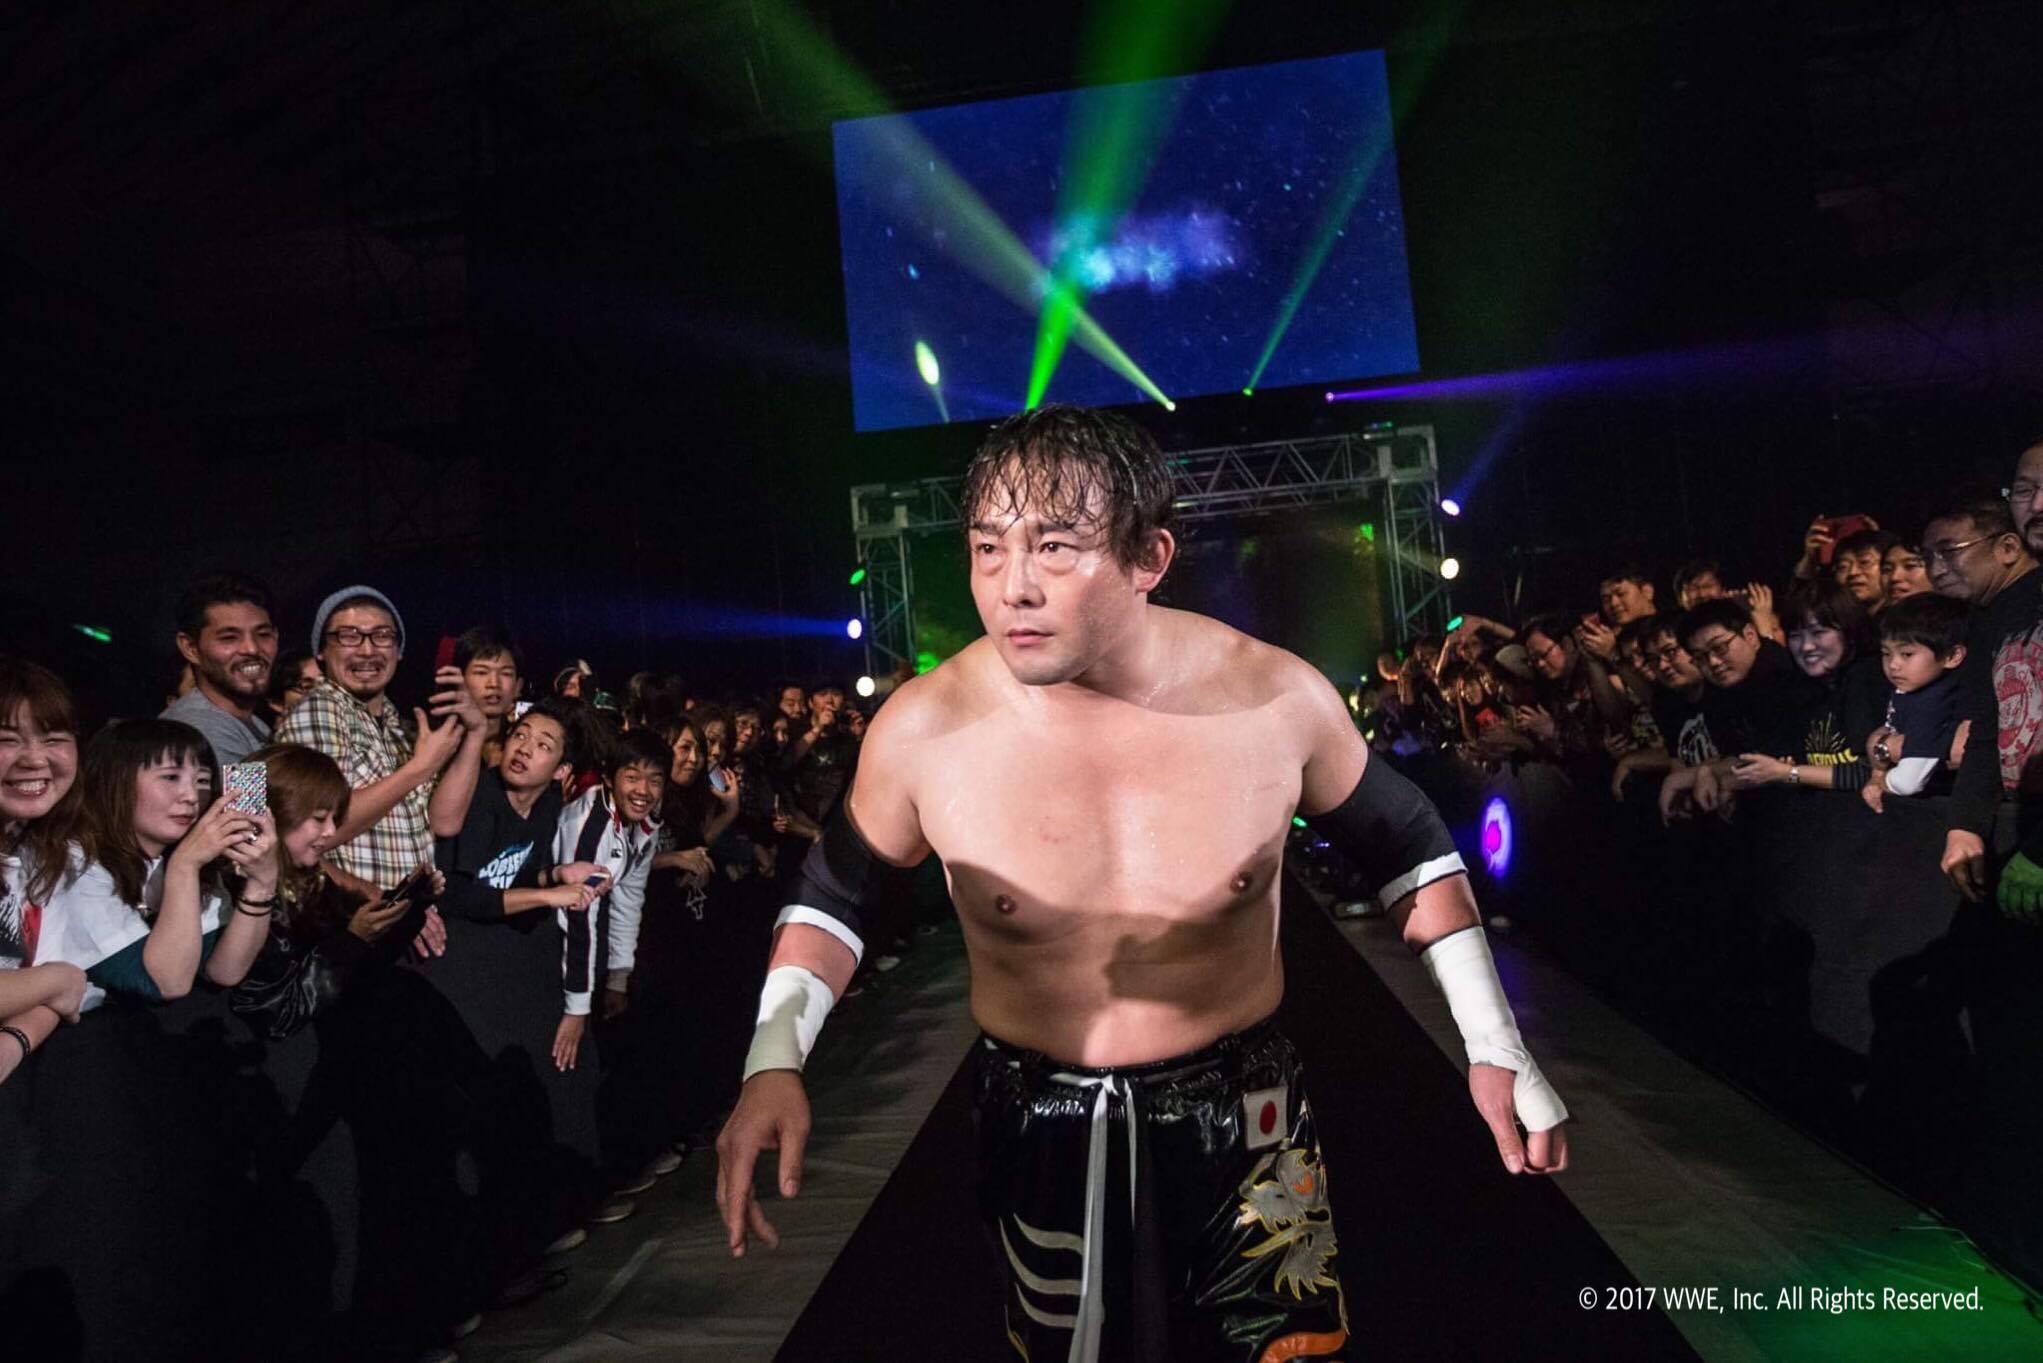 【WWE】TAJIRIがWWEにクルーザー級部門の新たな一員として正式参戦!